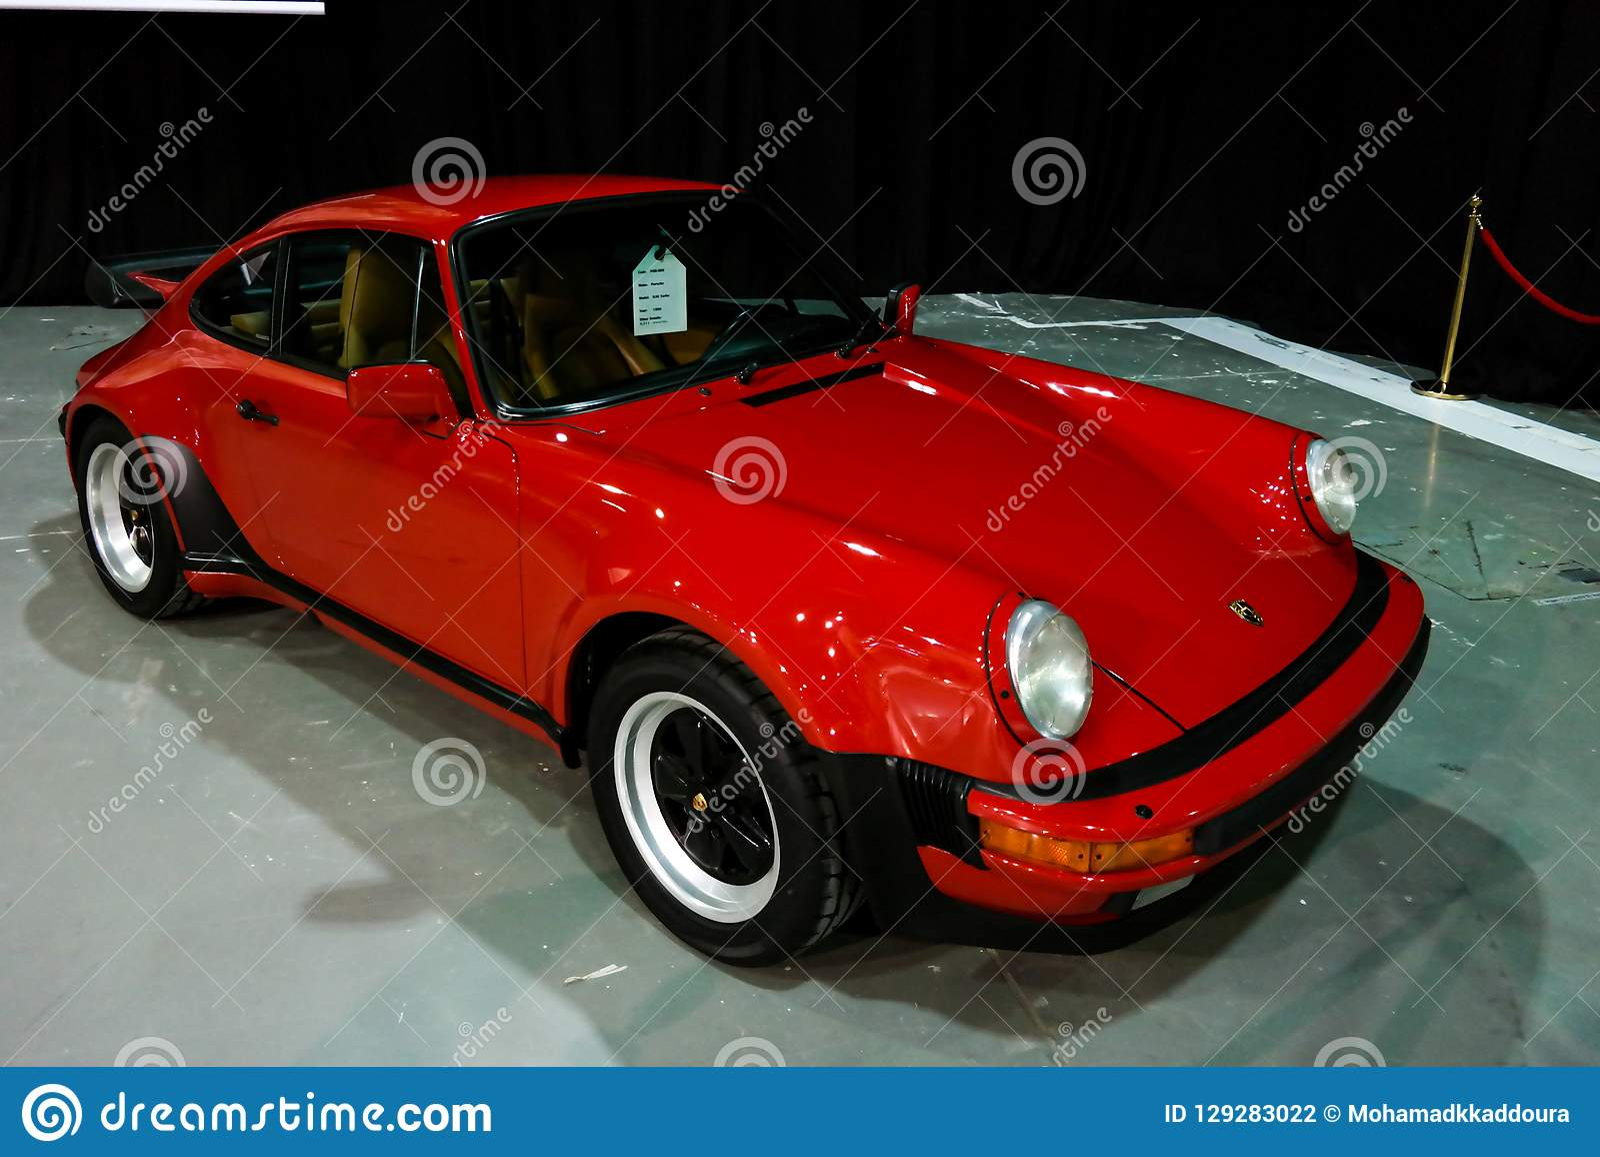 Dubai Motor Porsche Corner Displaying Their Epic New 911 Cars Turbo S Editorial Photography Image Of Luxury Lifestyle 129283022